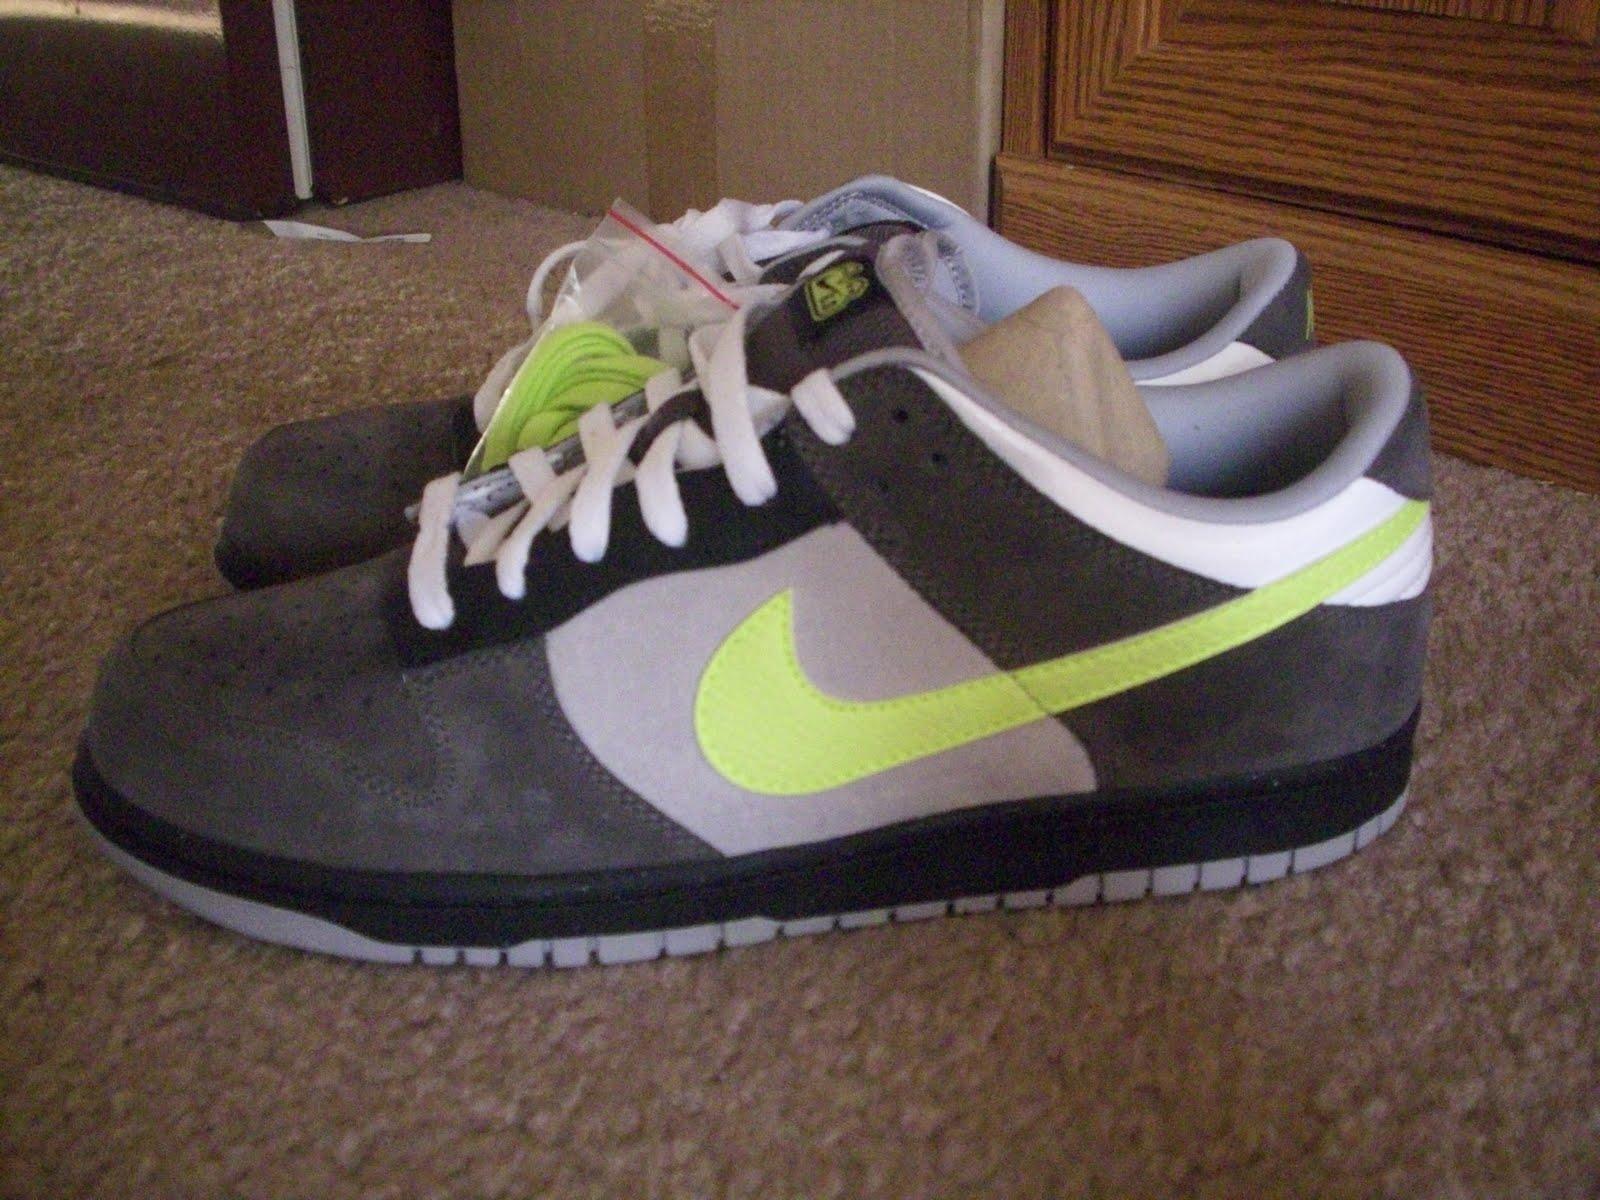 http://4.bp.blogspot.com/_fUgJOjuM6N8/TBLA-L4nKoI/AAAAAAAAAAk/1BnMwm7WyZs/s1600/sneakers%2B001.JPG